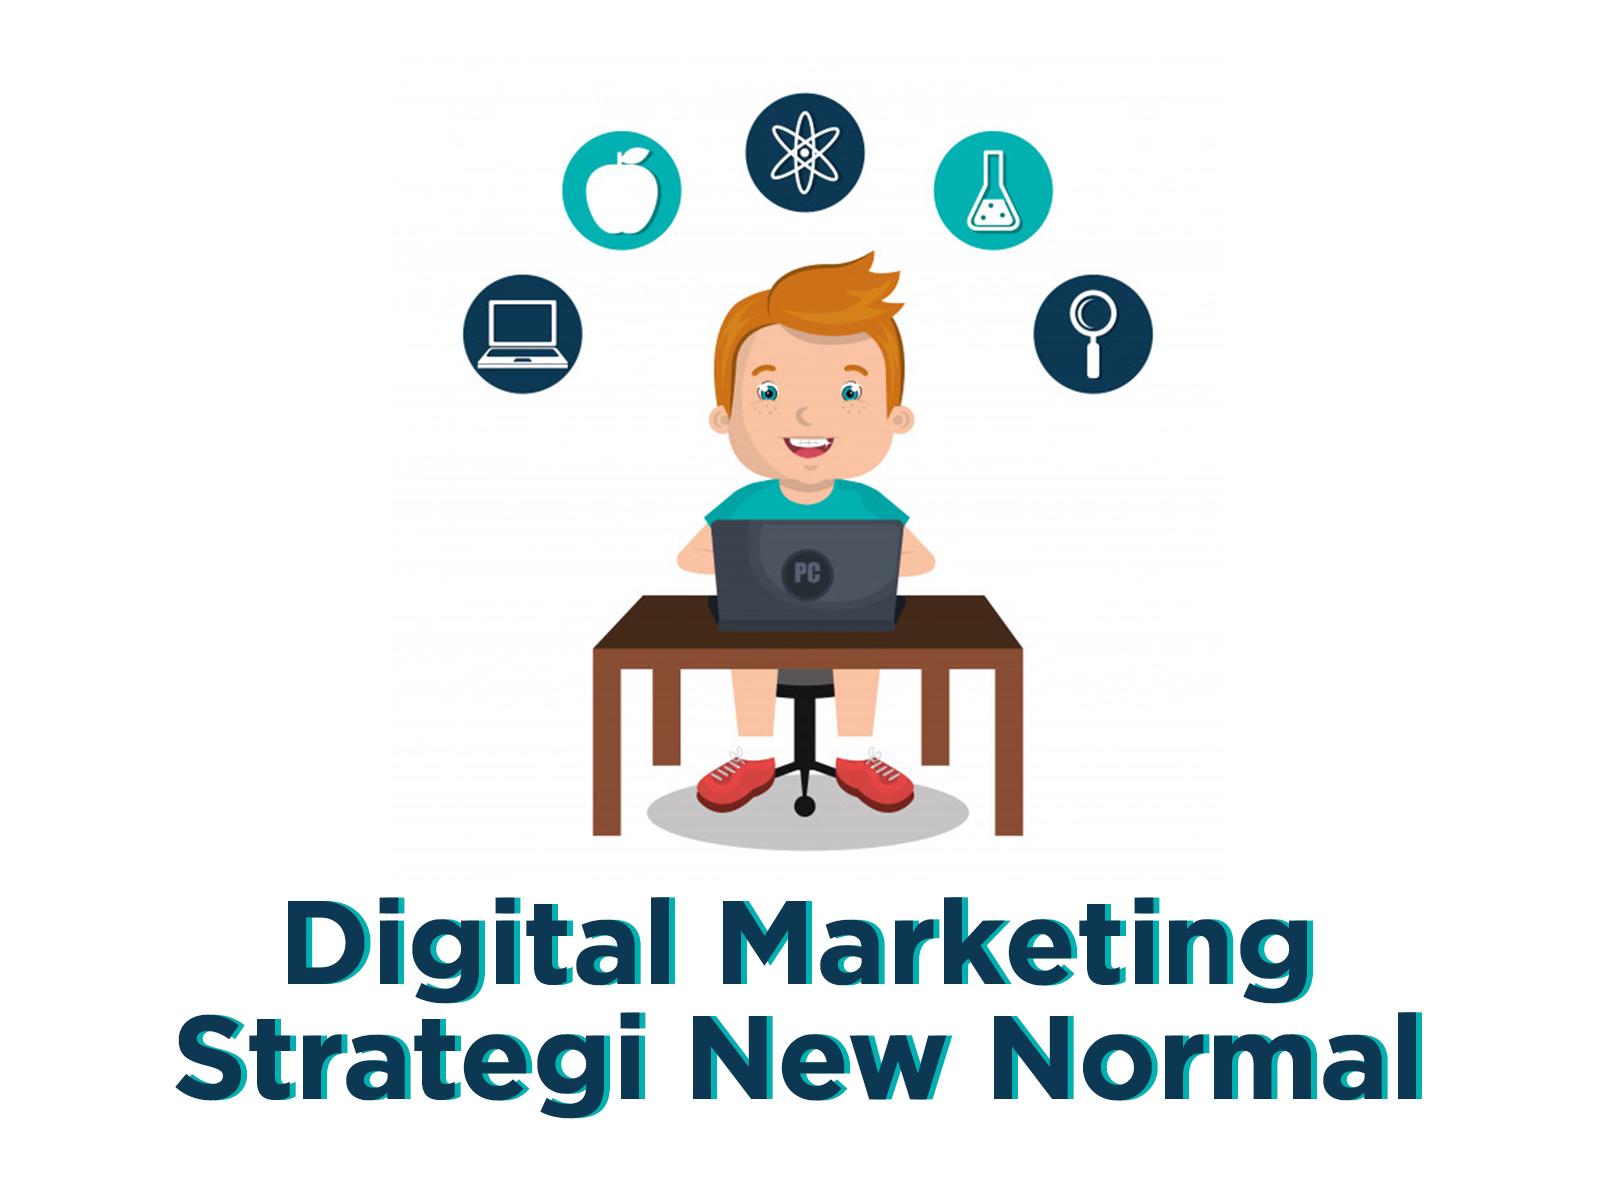 Digital Marketing Strategi New Normal